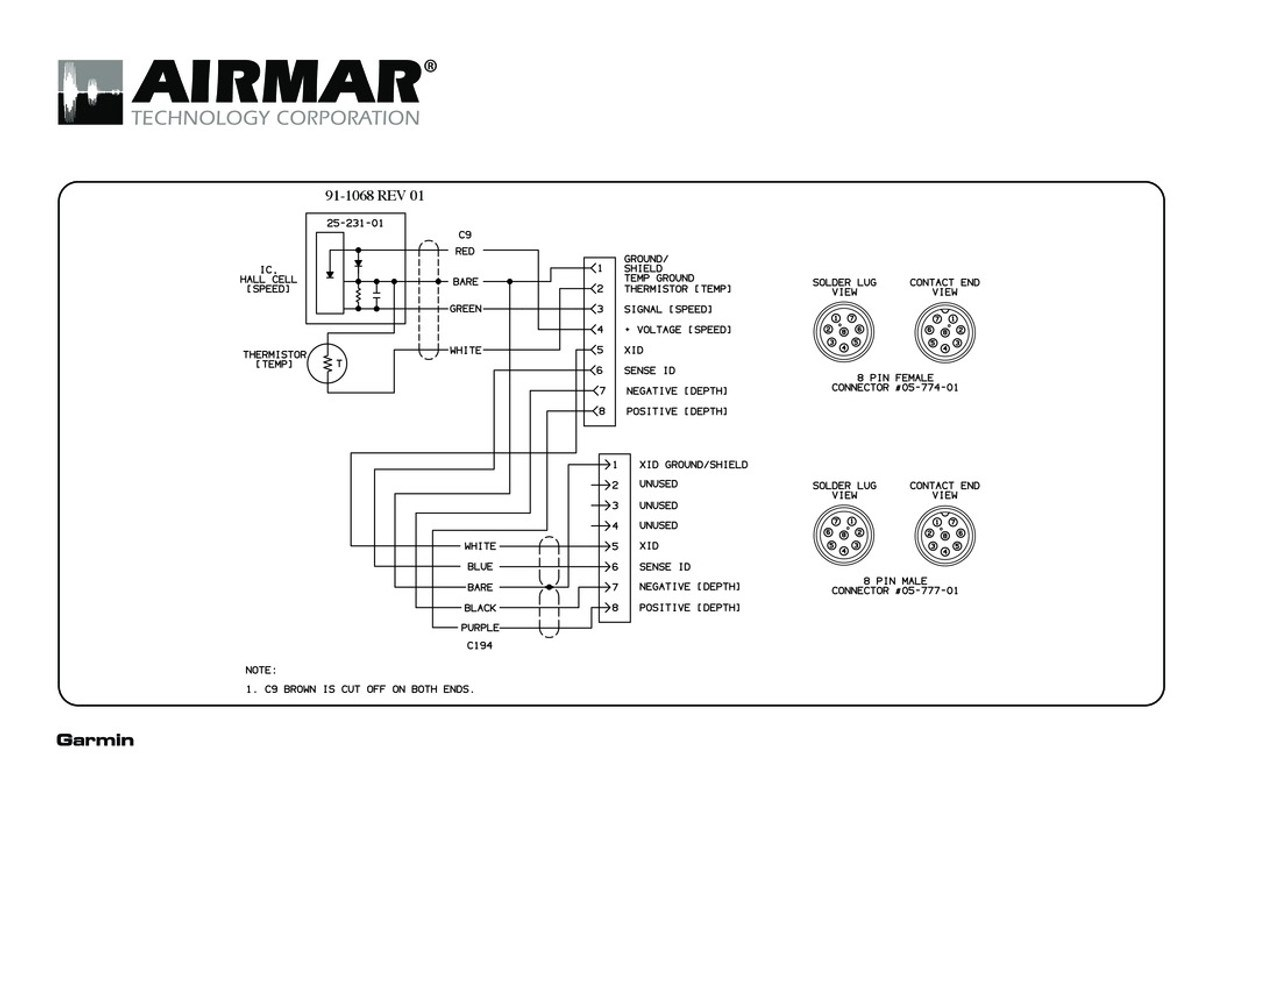 medium resolution of airmar wiring diagram garmin st850 8 pin s t blue bottle marine 4 pin din plug garmin 4 pin wiring diagram